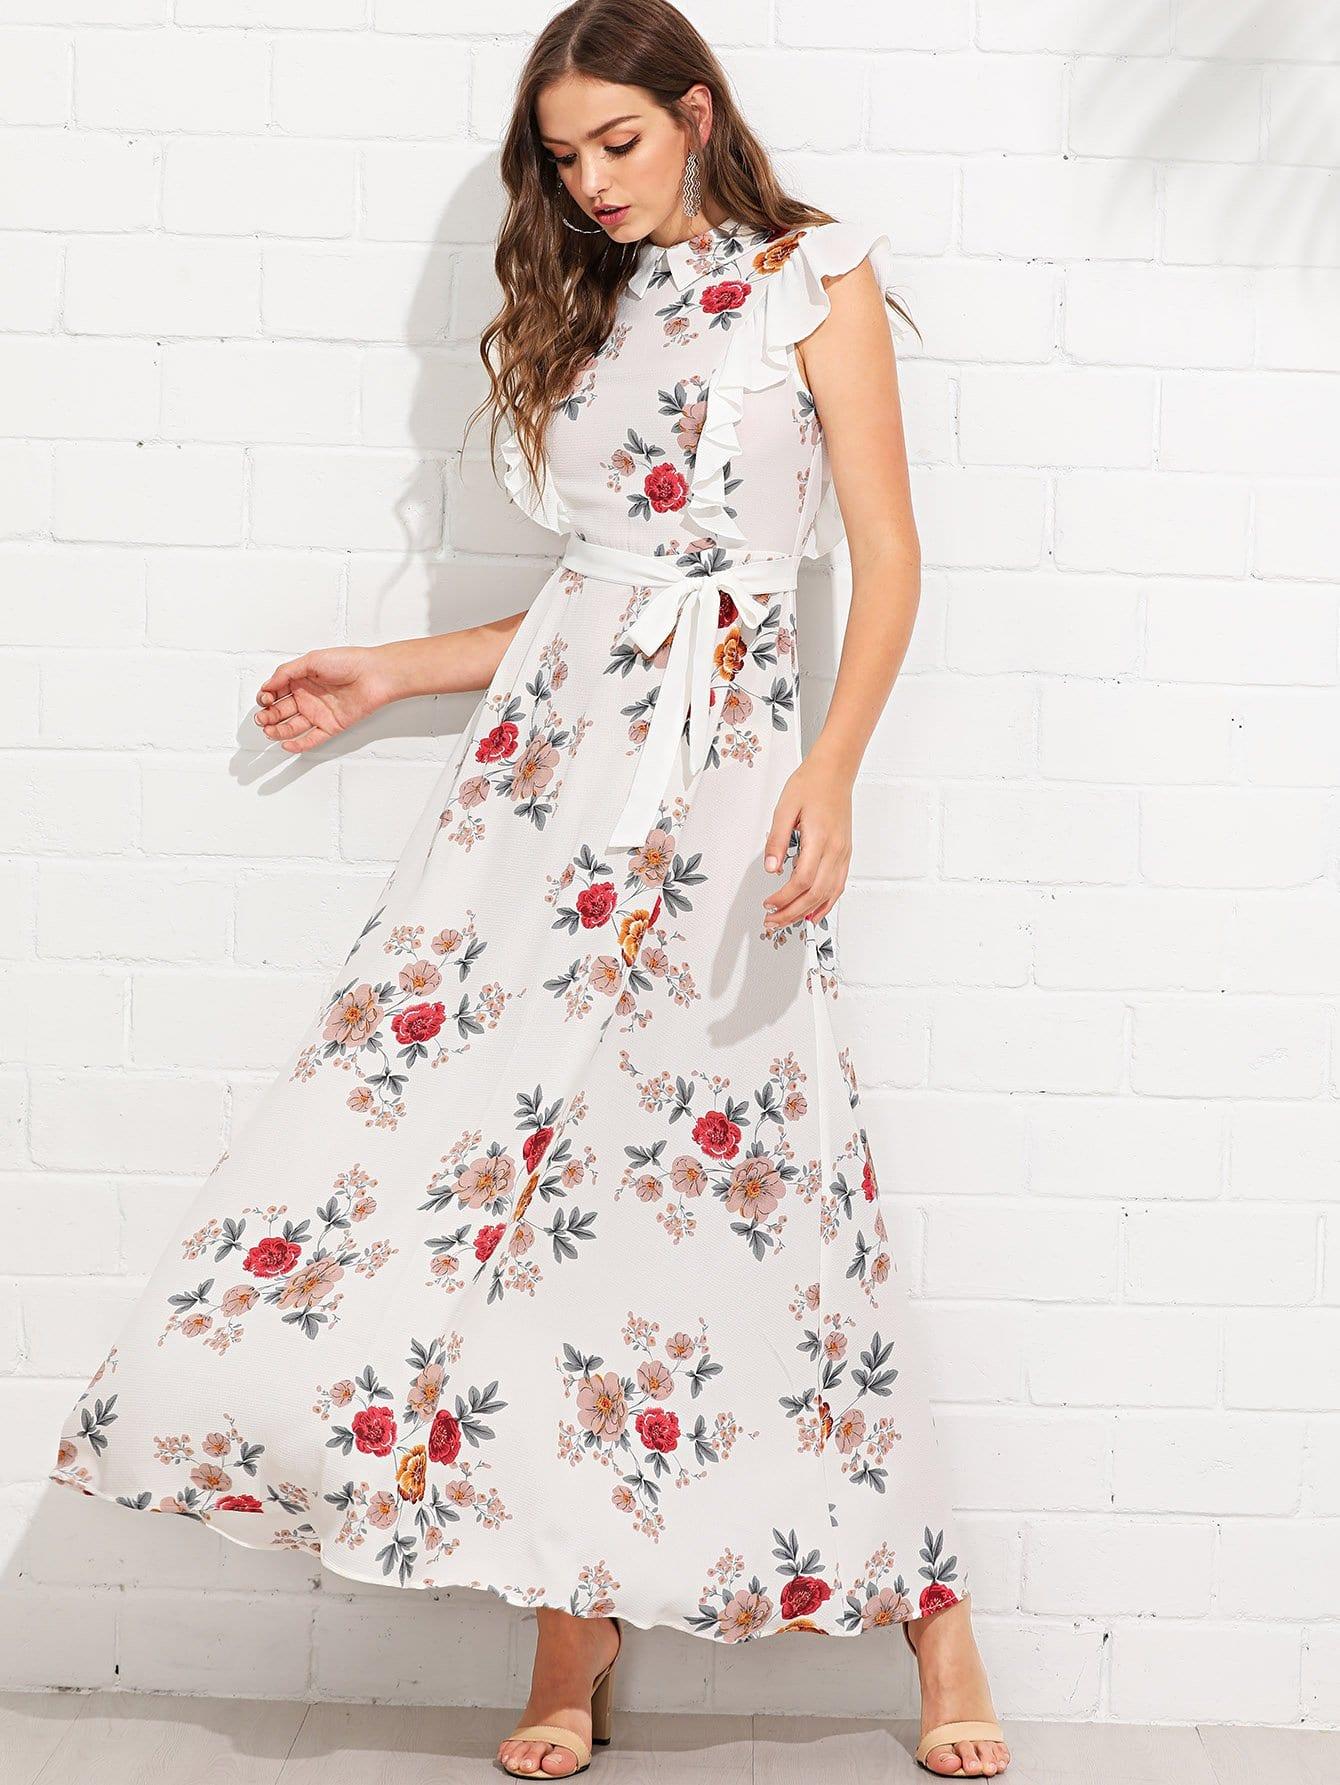 Ruffle Trim Self Belted Flower Print Collar Dress self belted solid ruffle trim dress